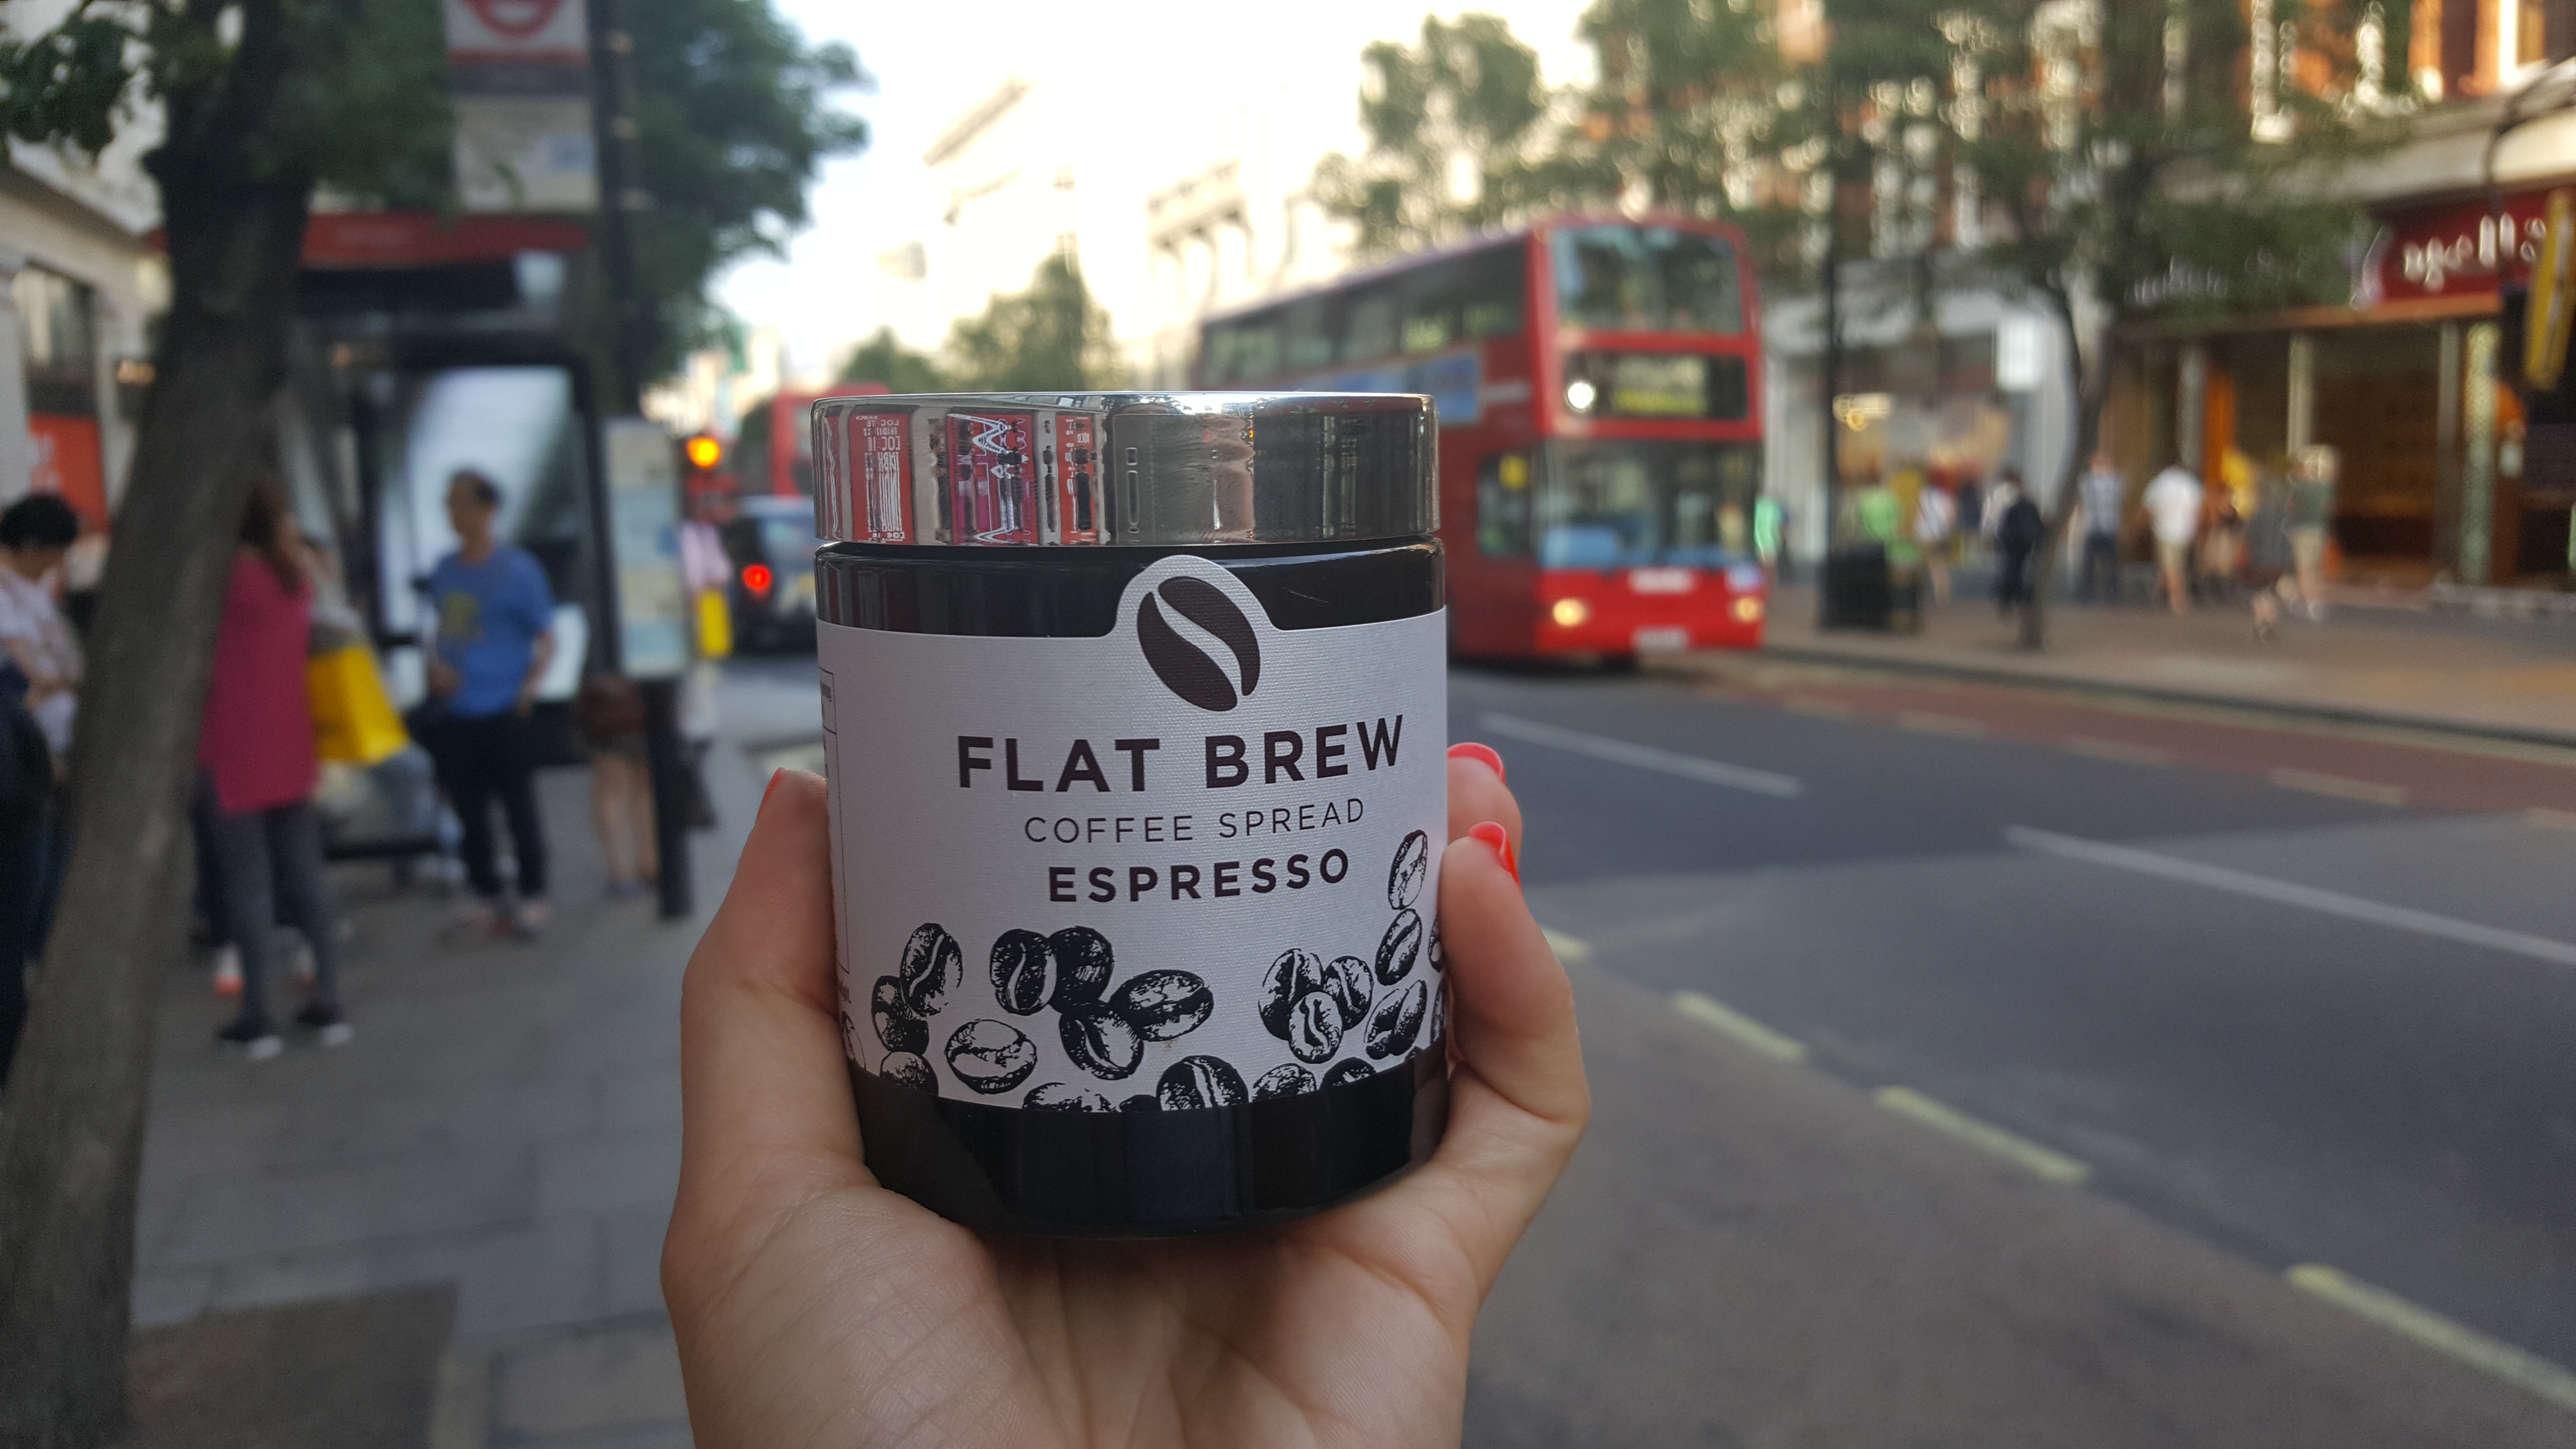 Flat Brew - coffee spread